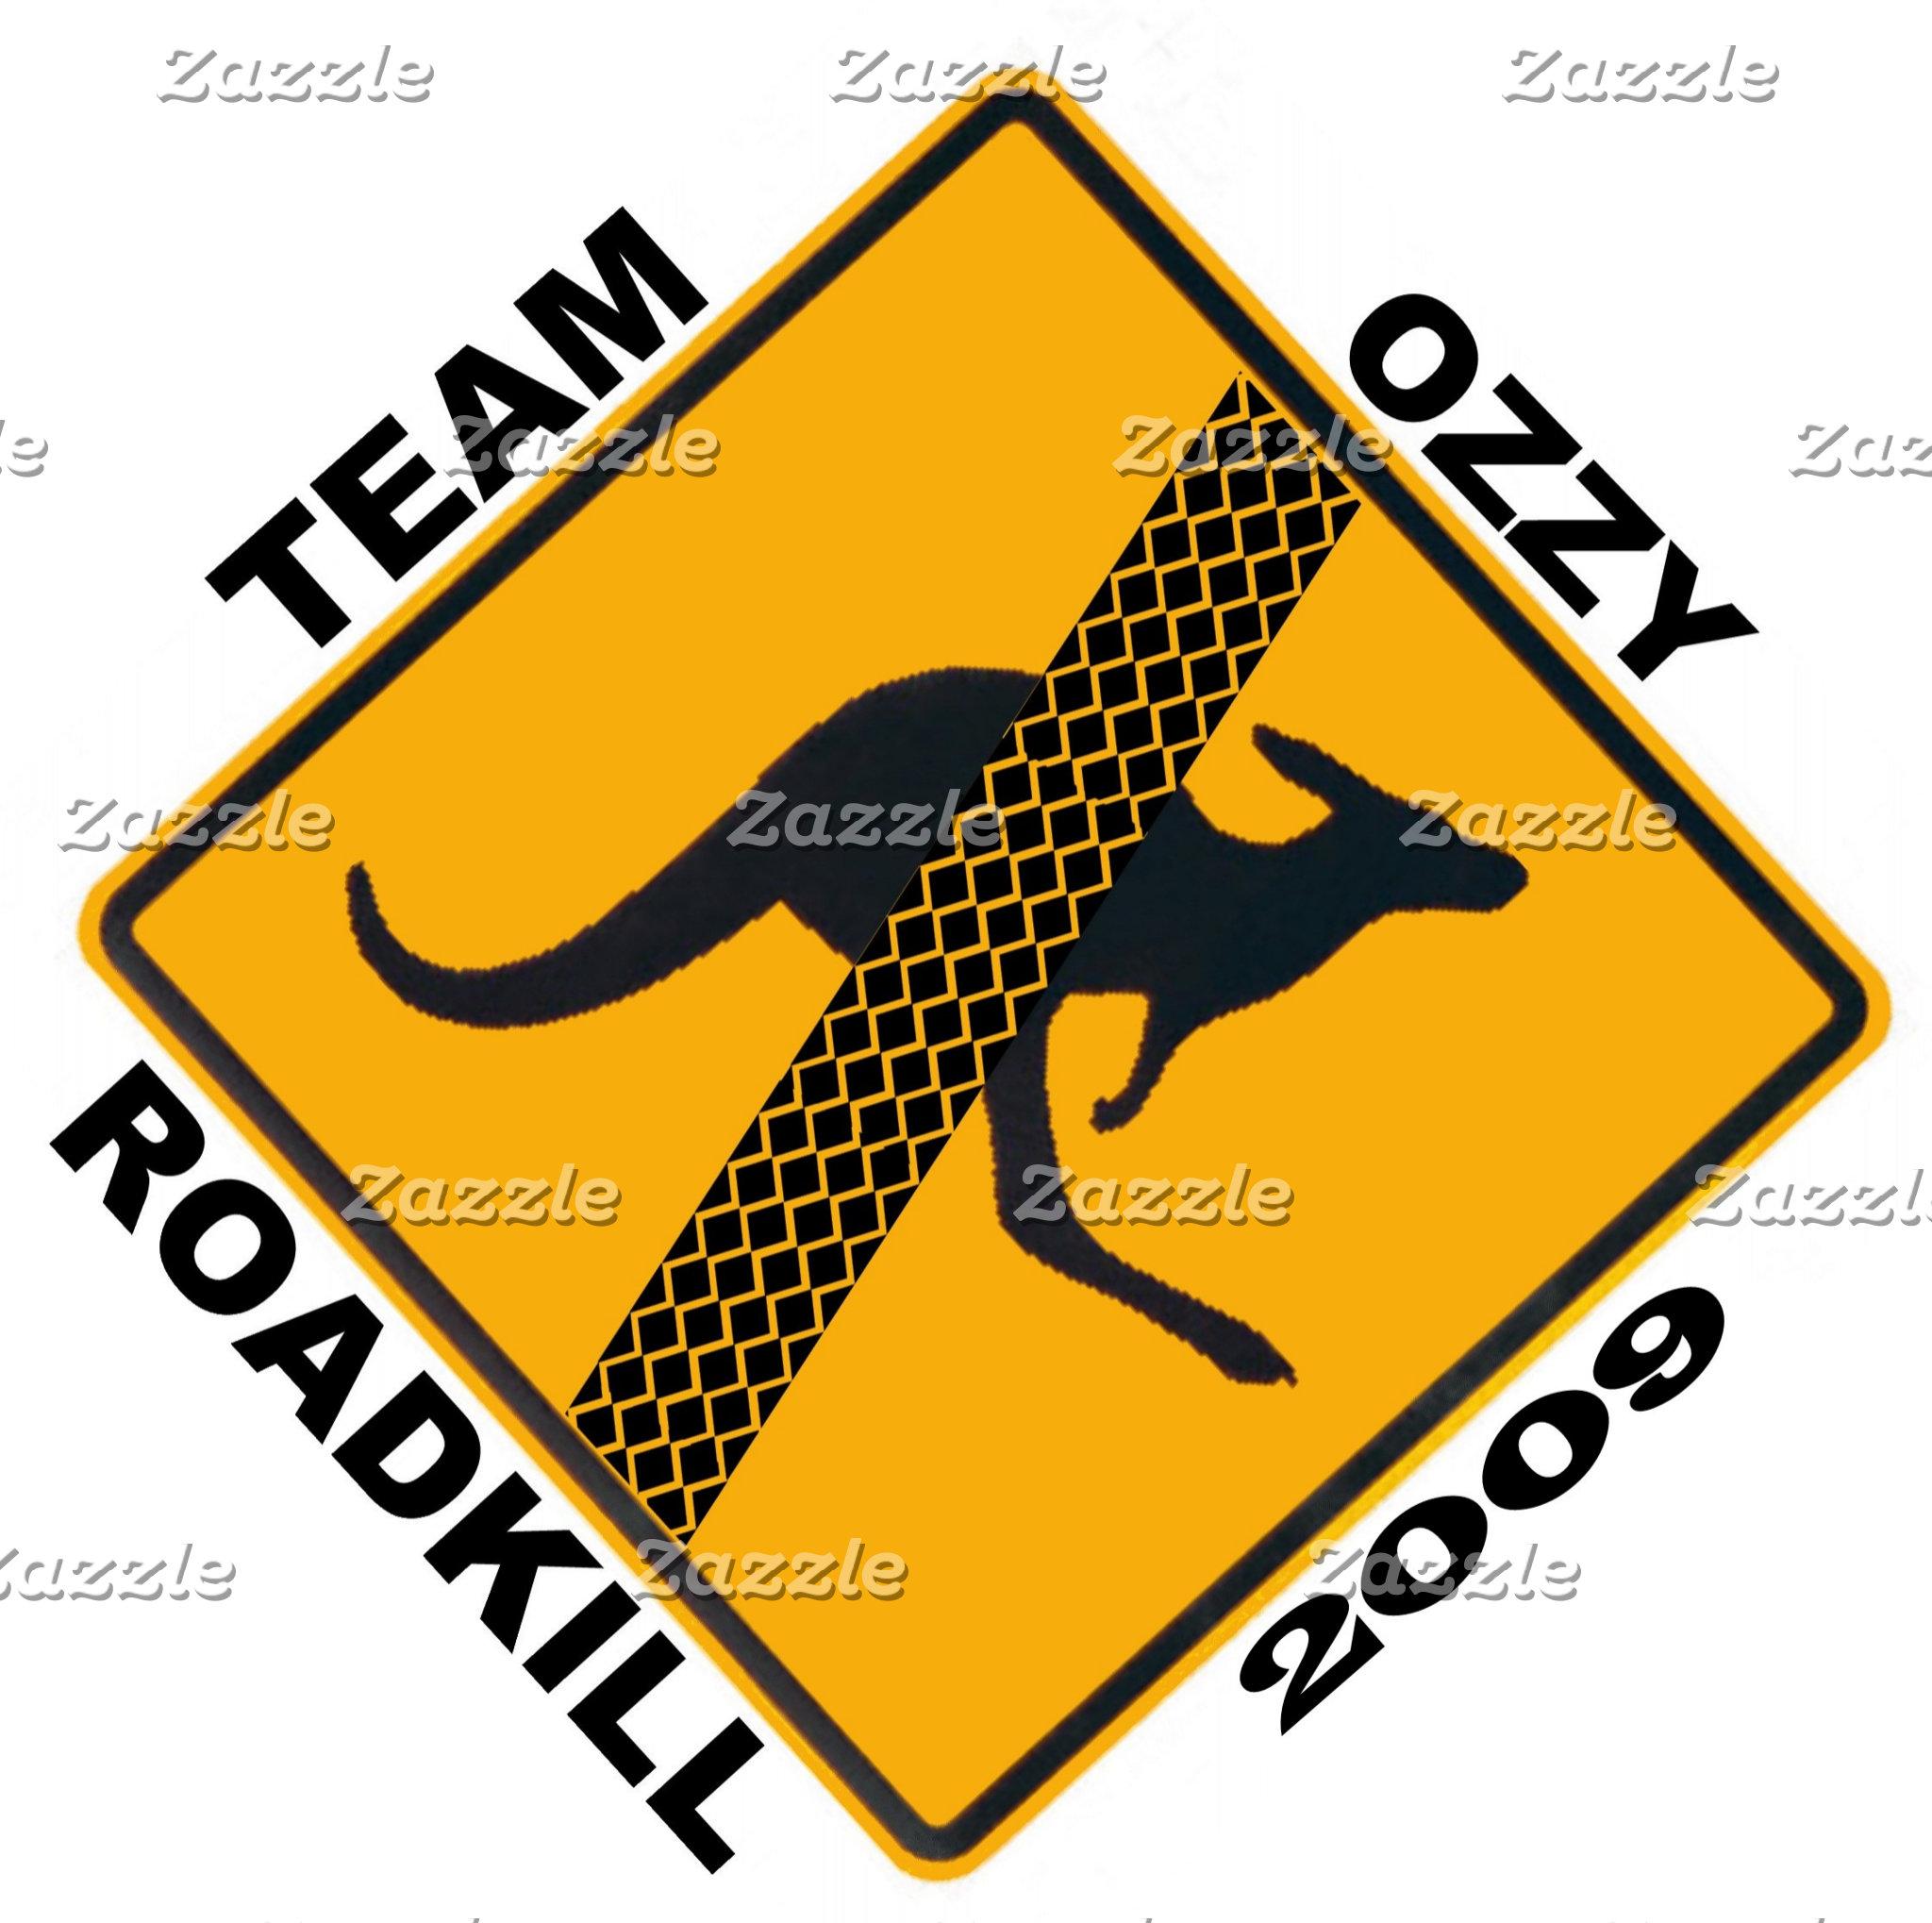 Team Ozzy Roadkill